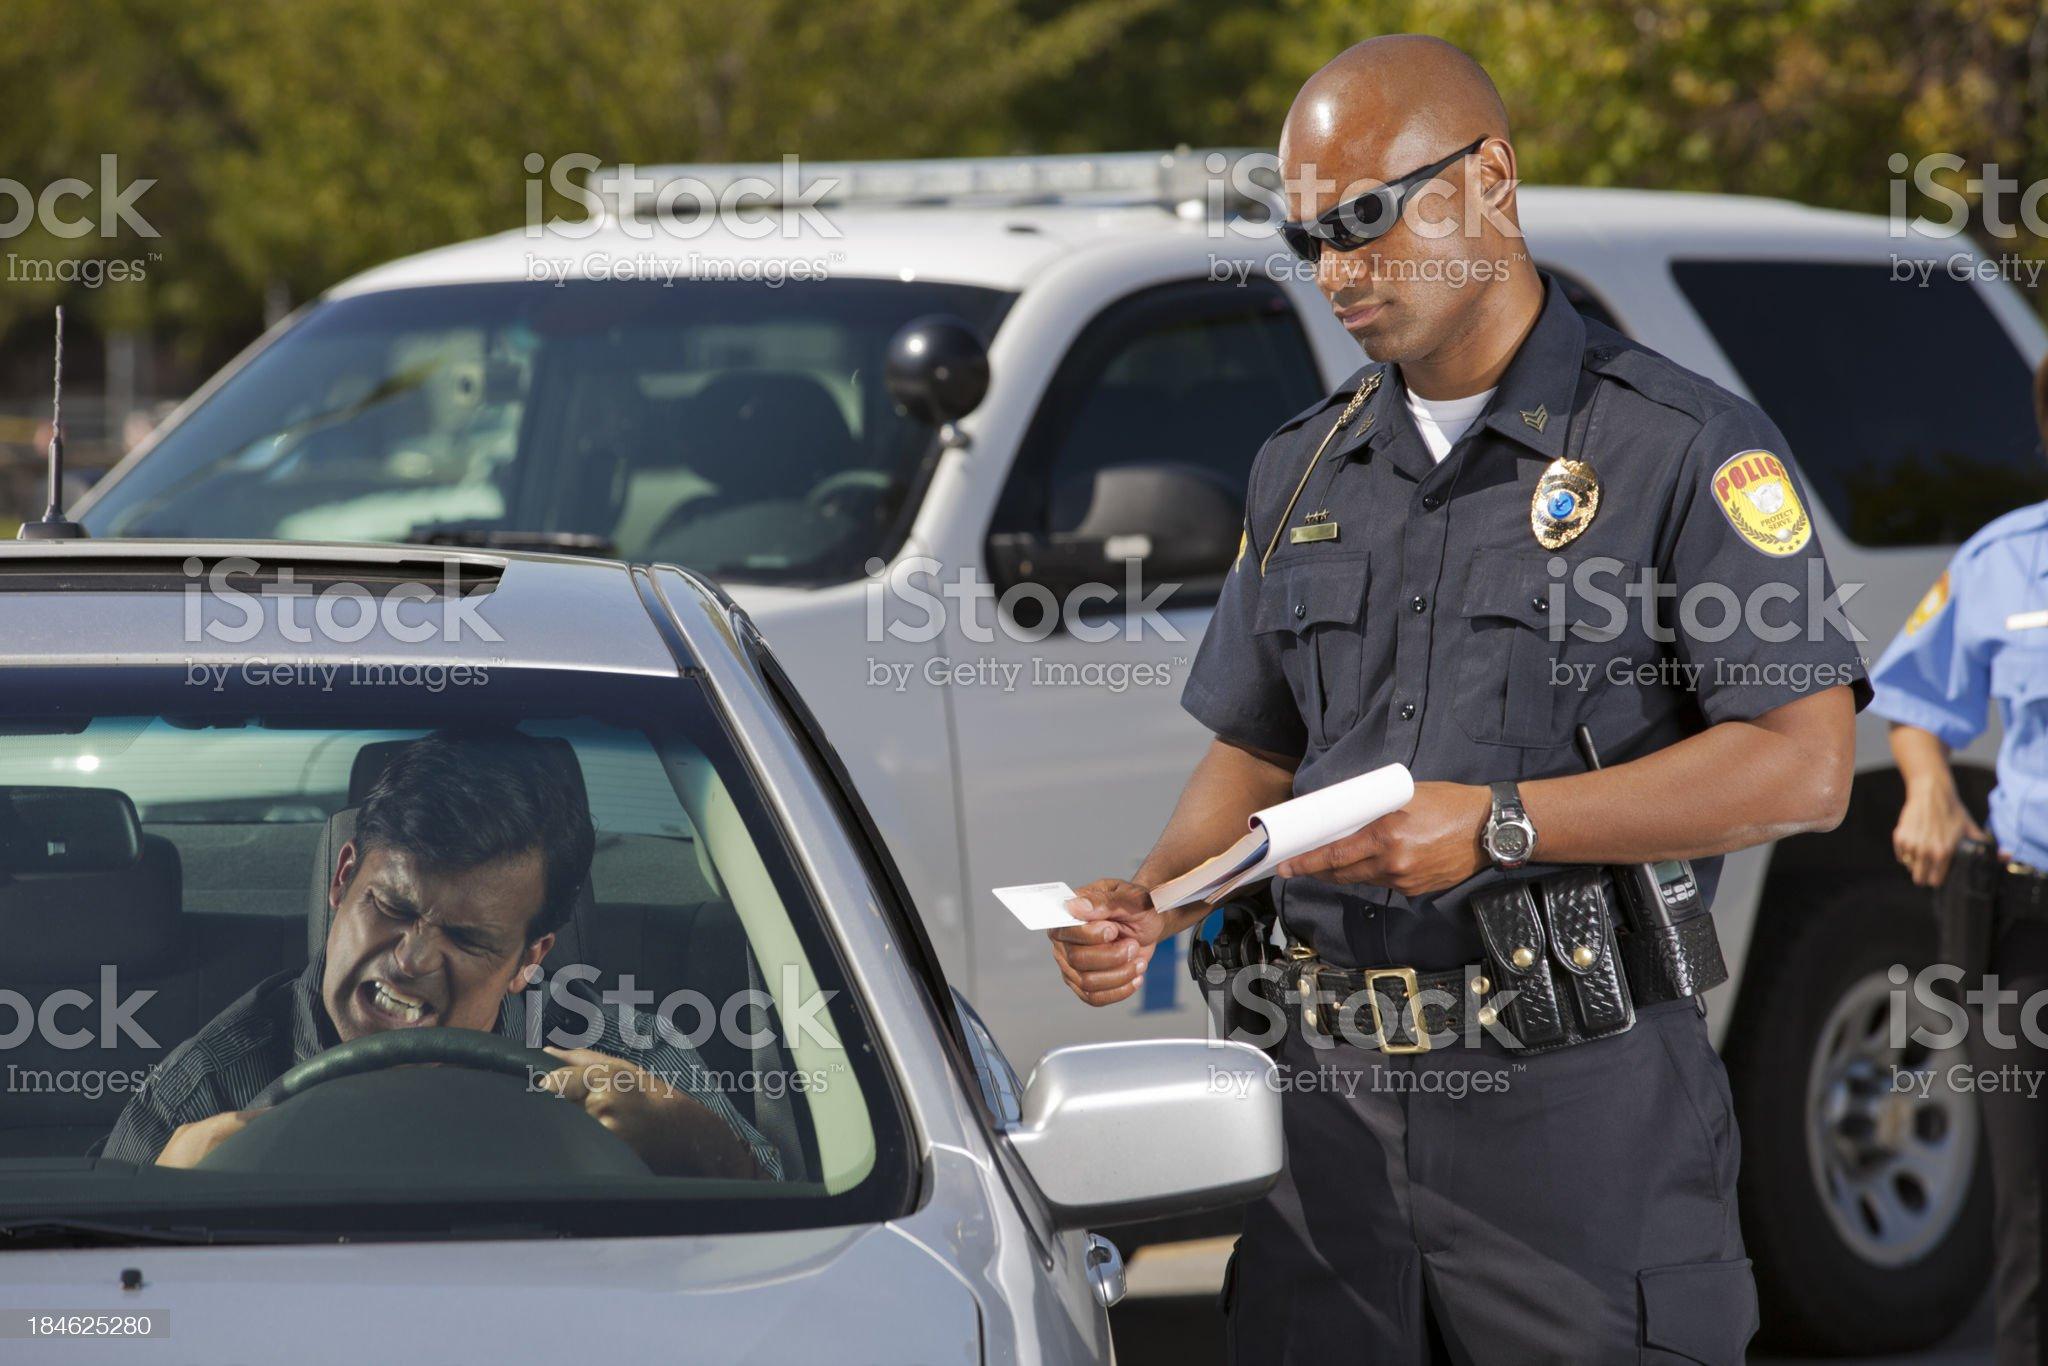 Driver mad at Citation royalty-free stock photo